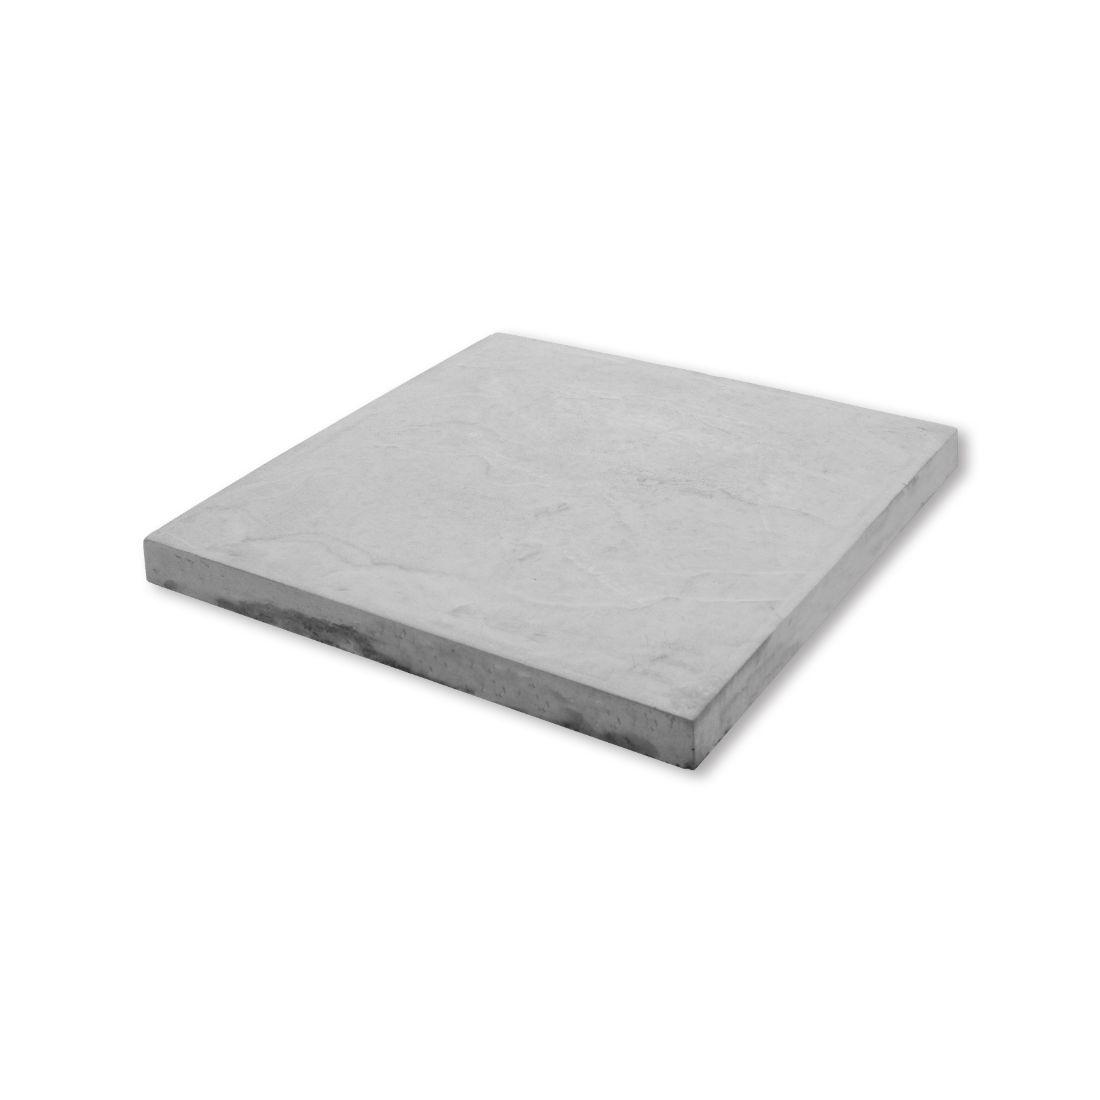 Romani Concrete Paver 450 x 450 x 37mm Natural Stone